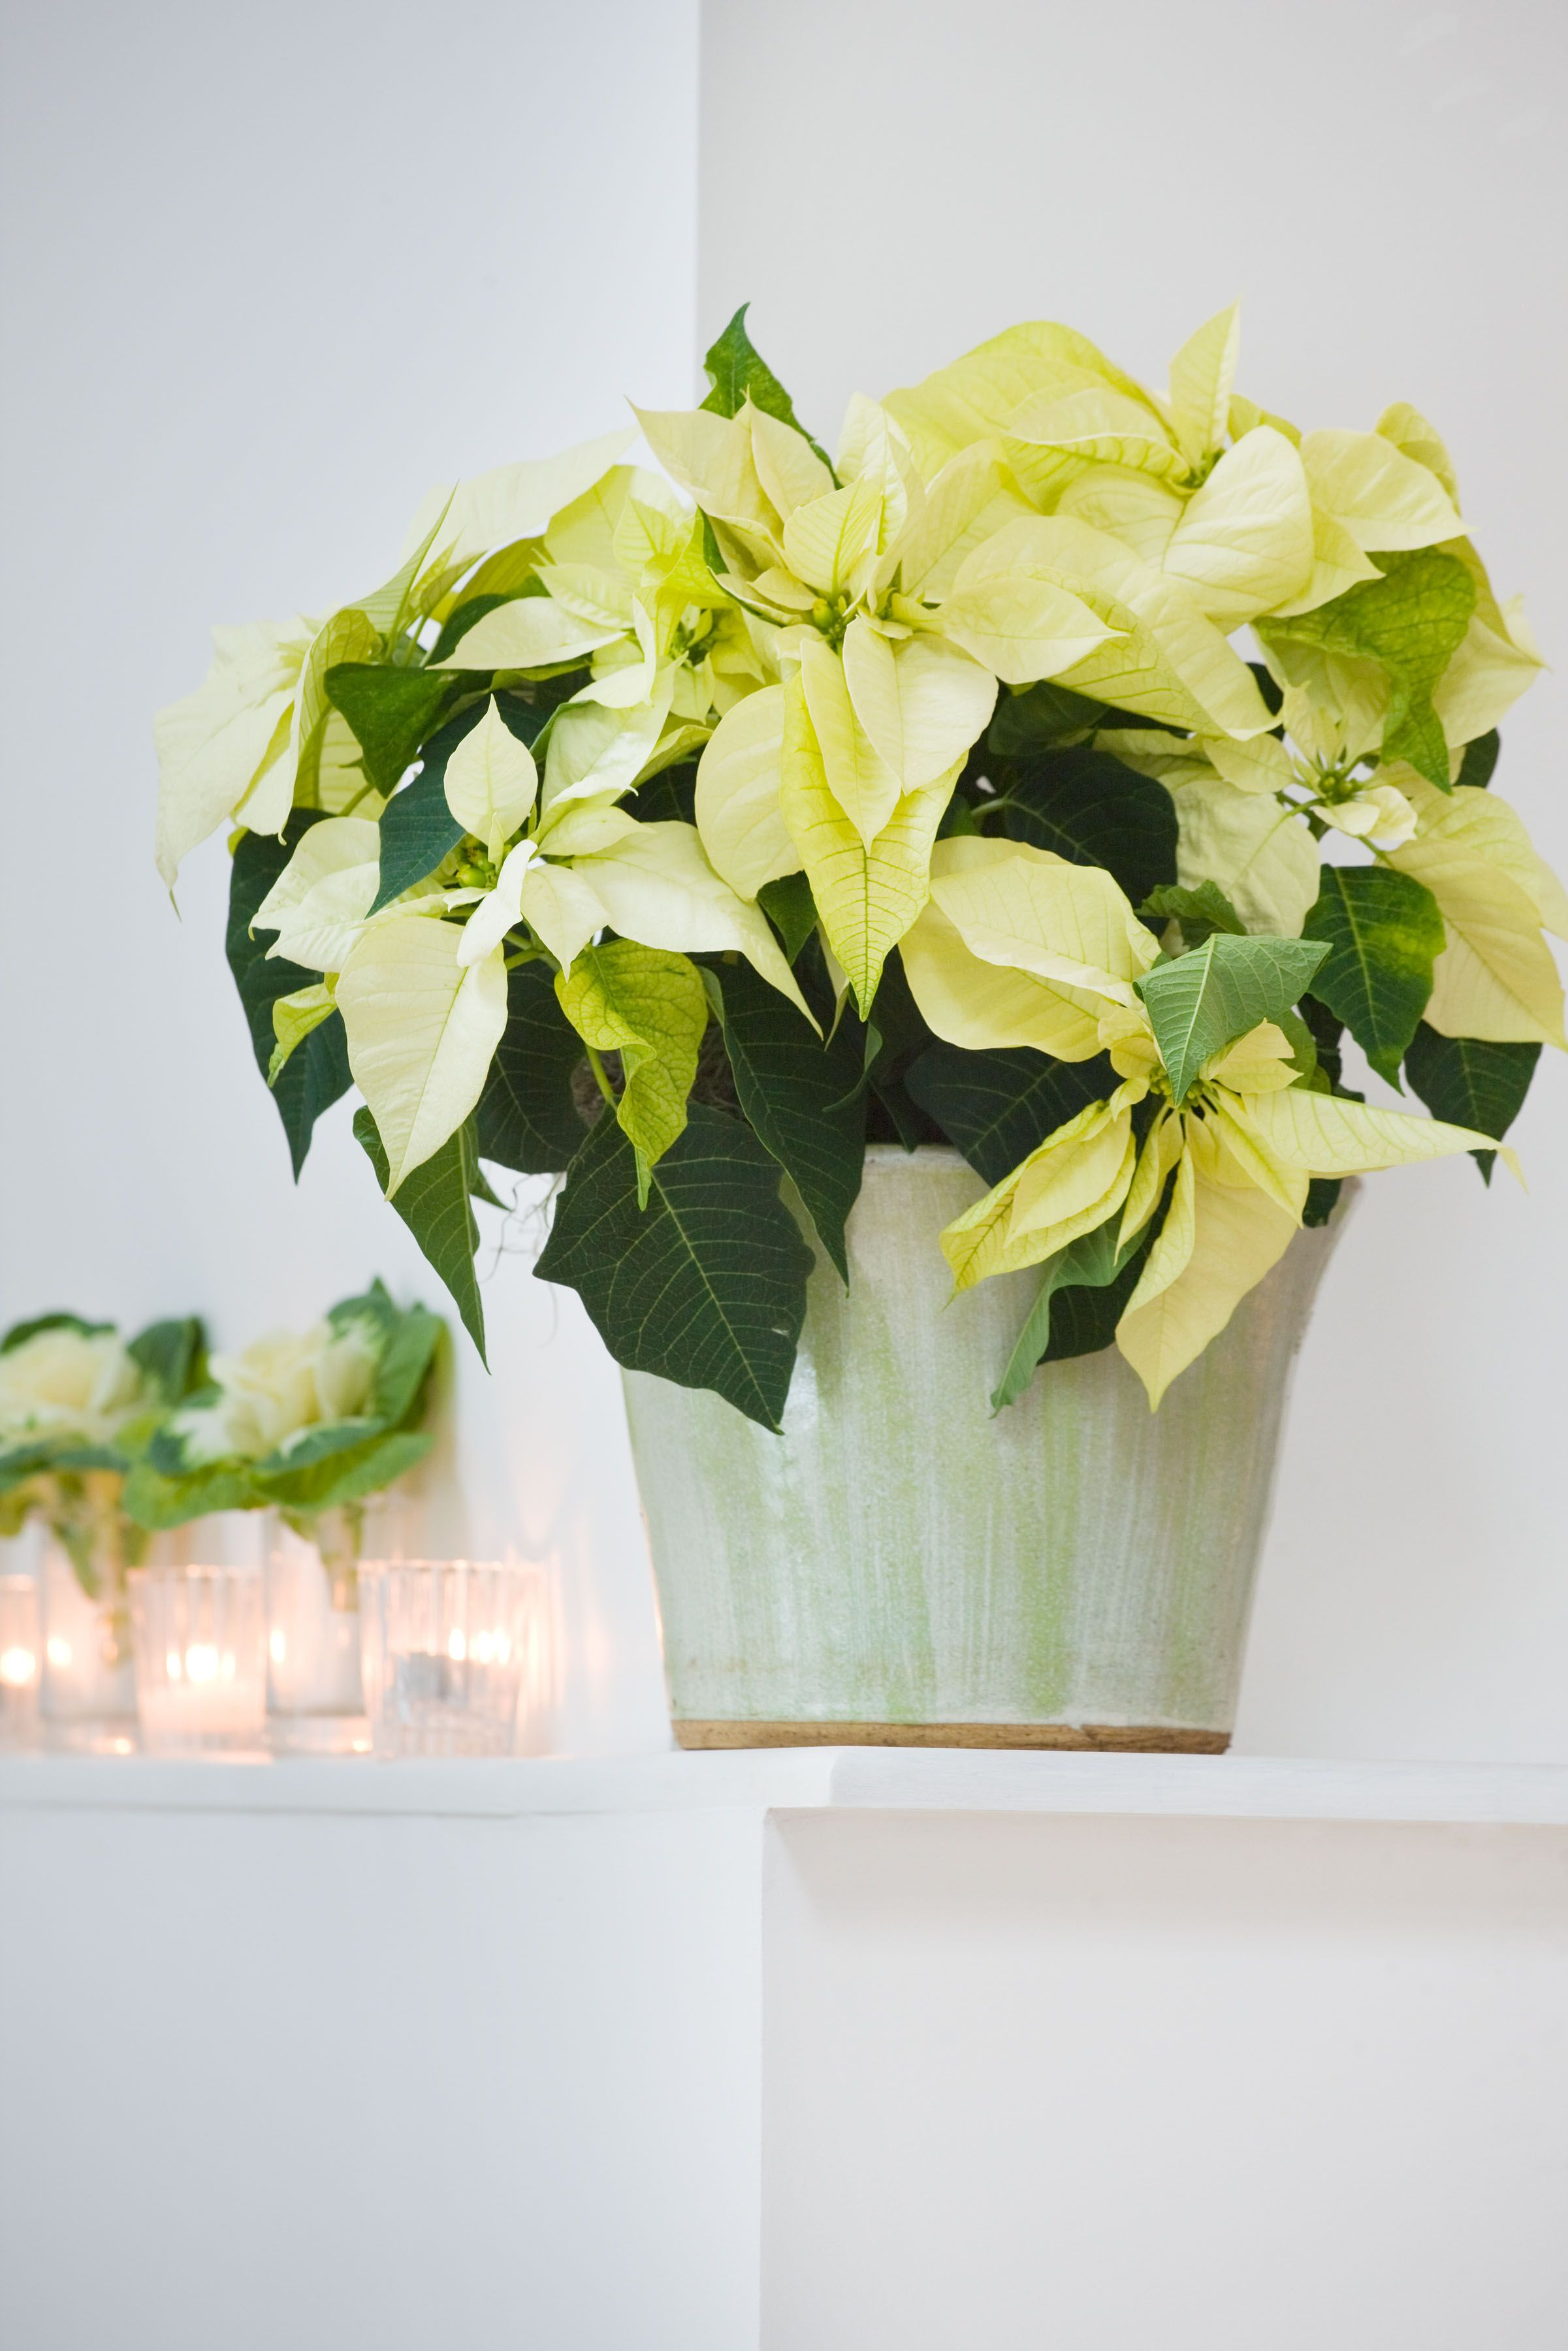 Cream/White seasonal Poinsettia. (With images) Christmas